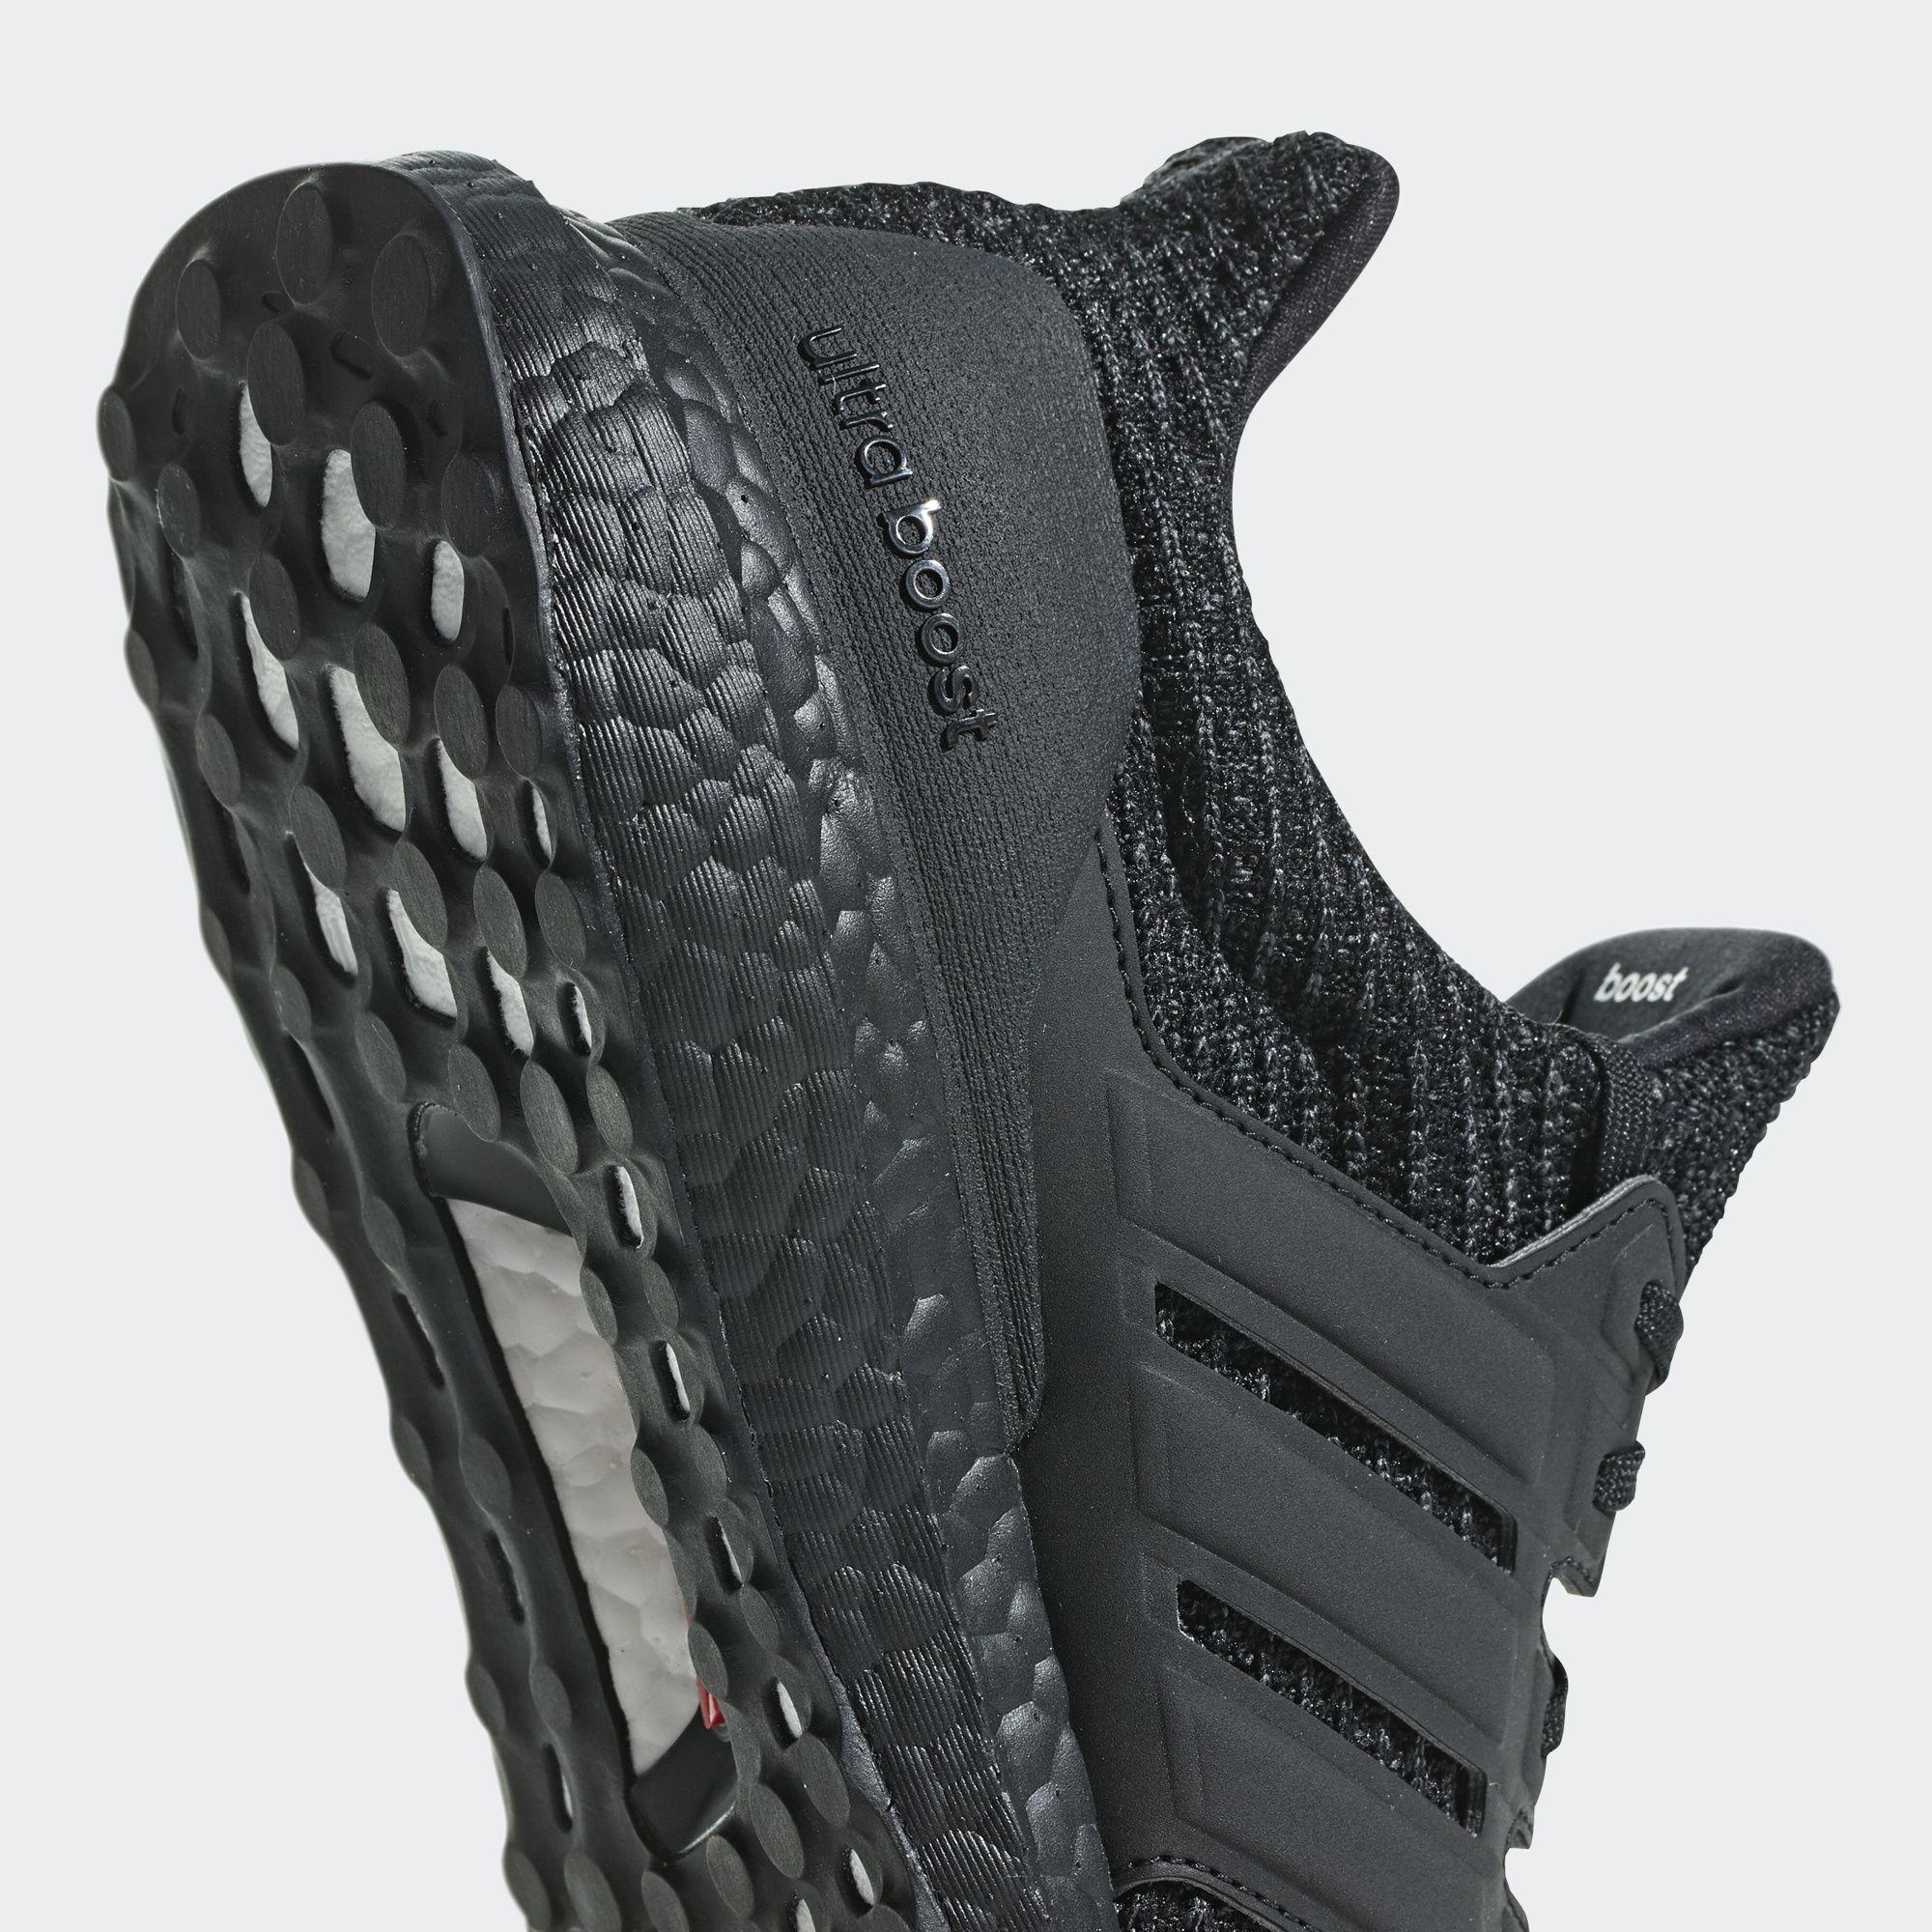 8d045d9263c2 adidas alerts on Twitter